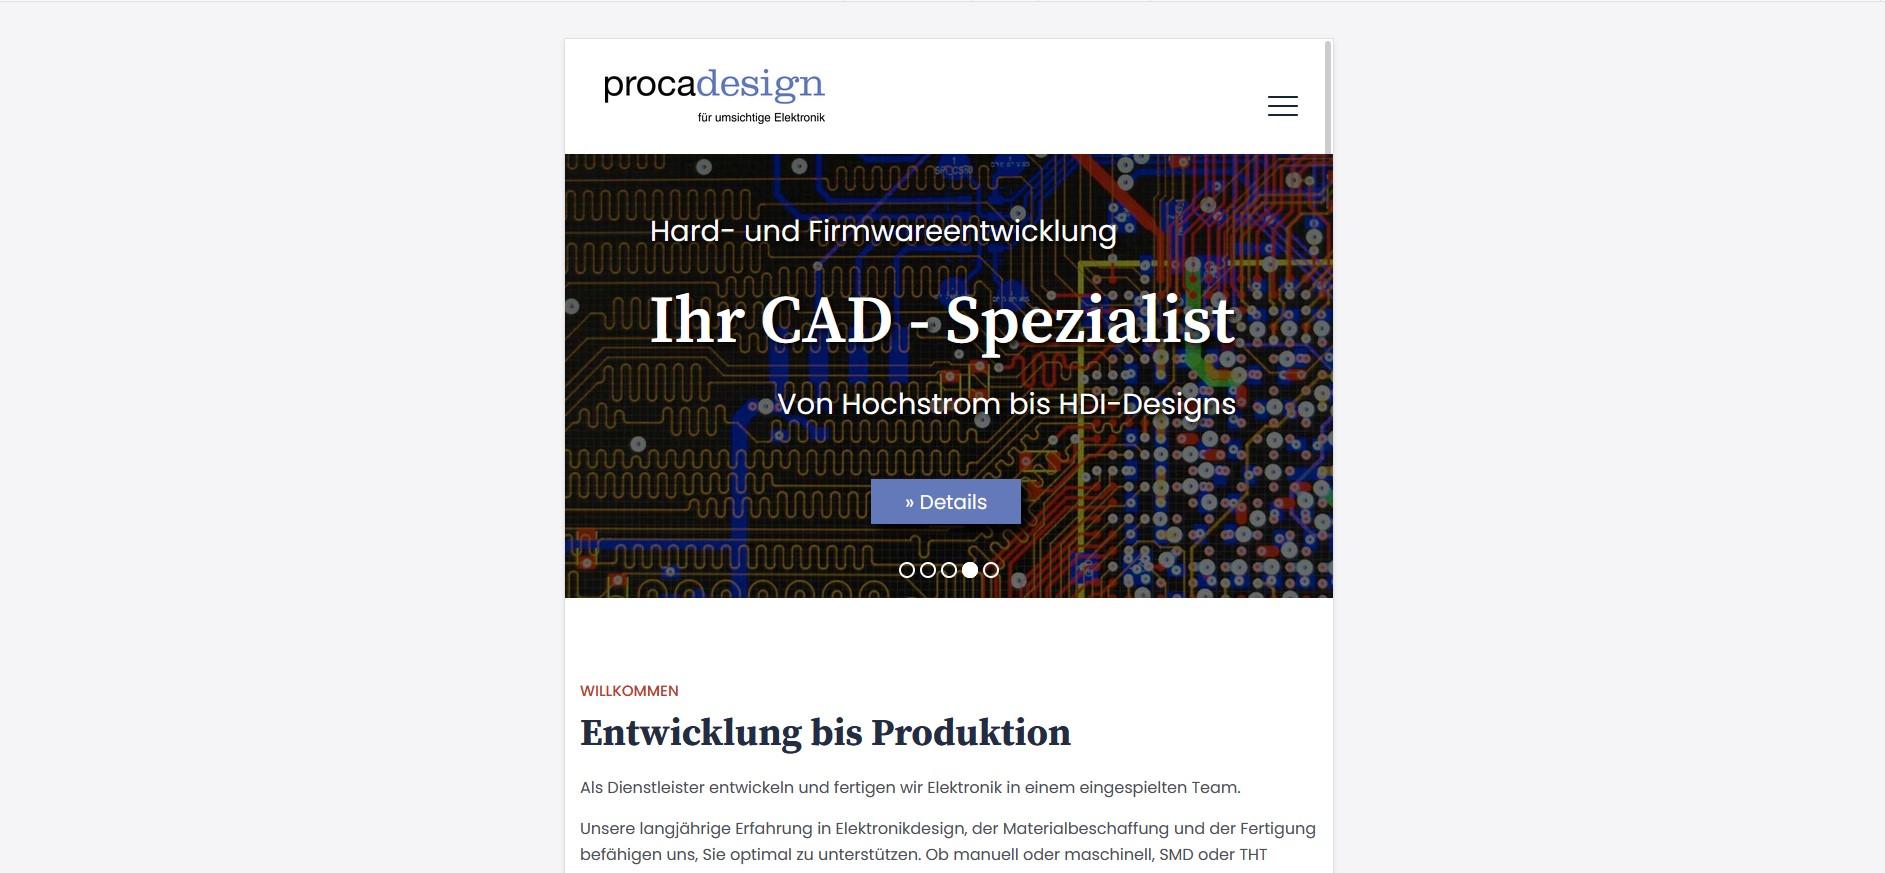 procadesign.ch